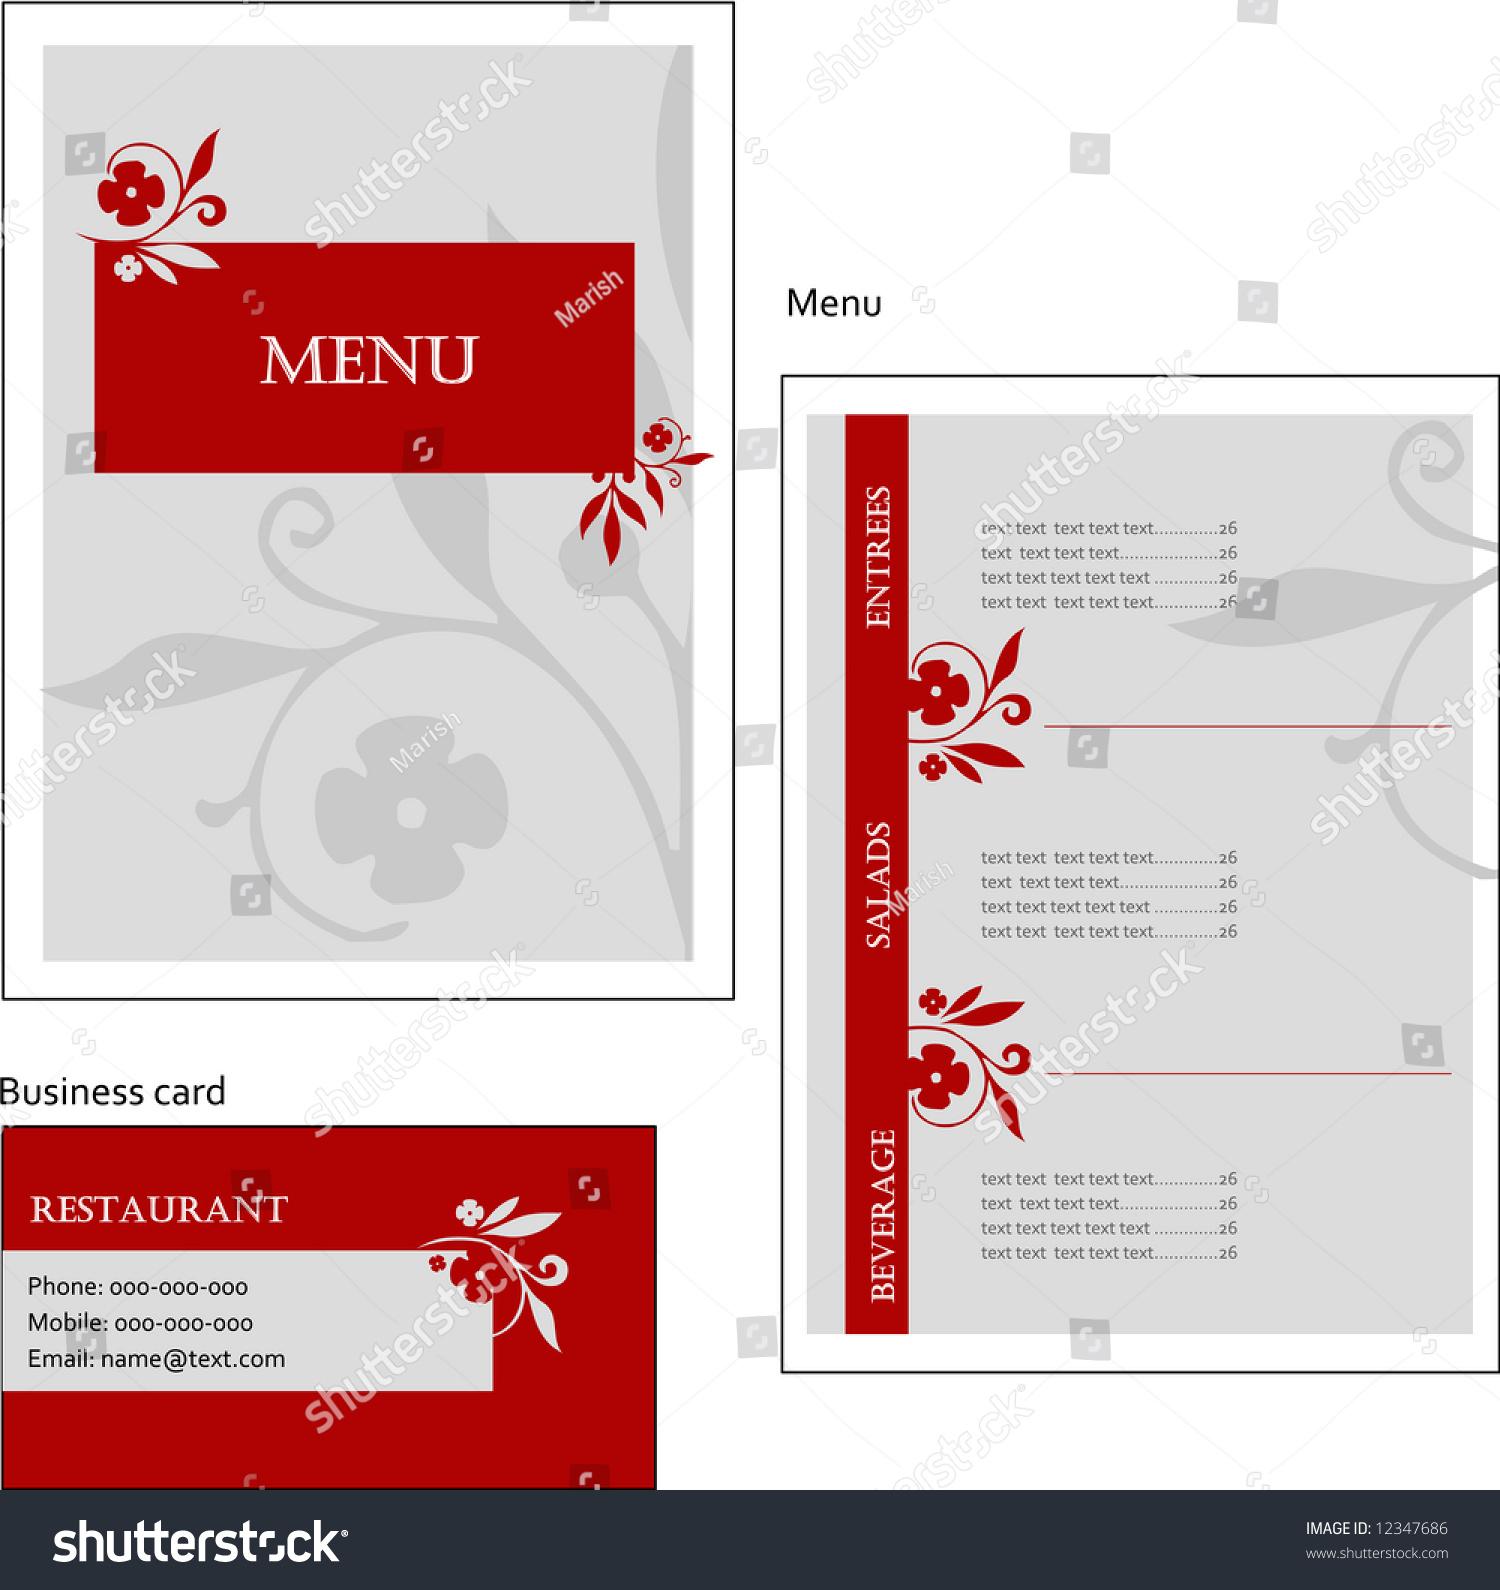 Template Designs European Menu Business Card Stock Vector 12347686 ...